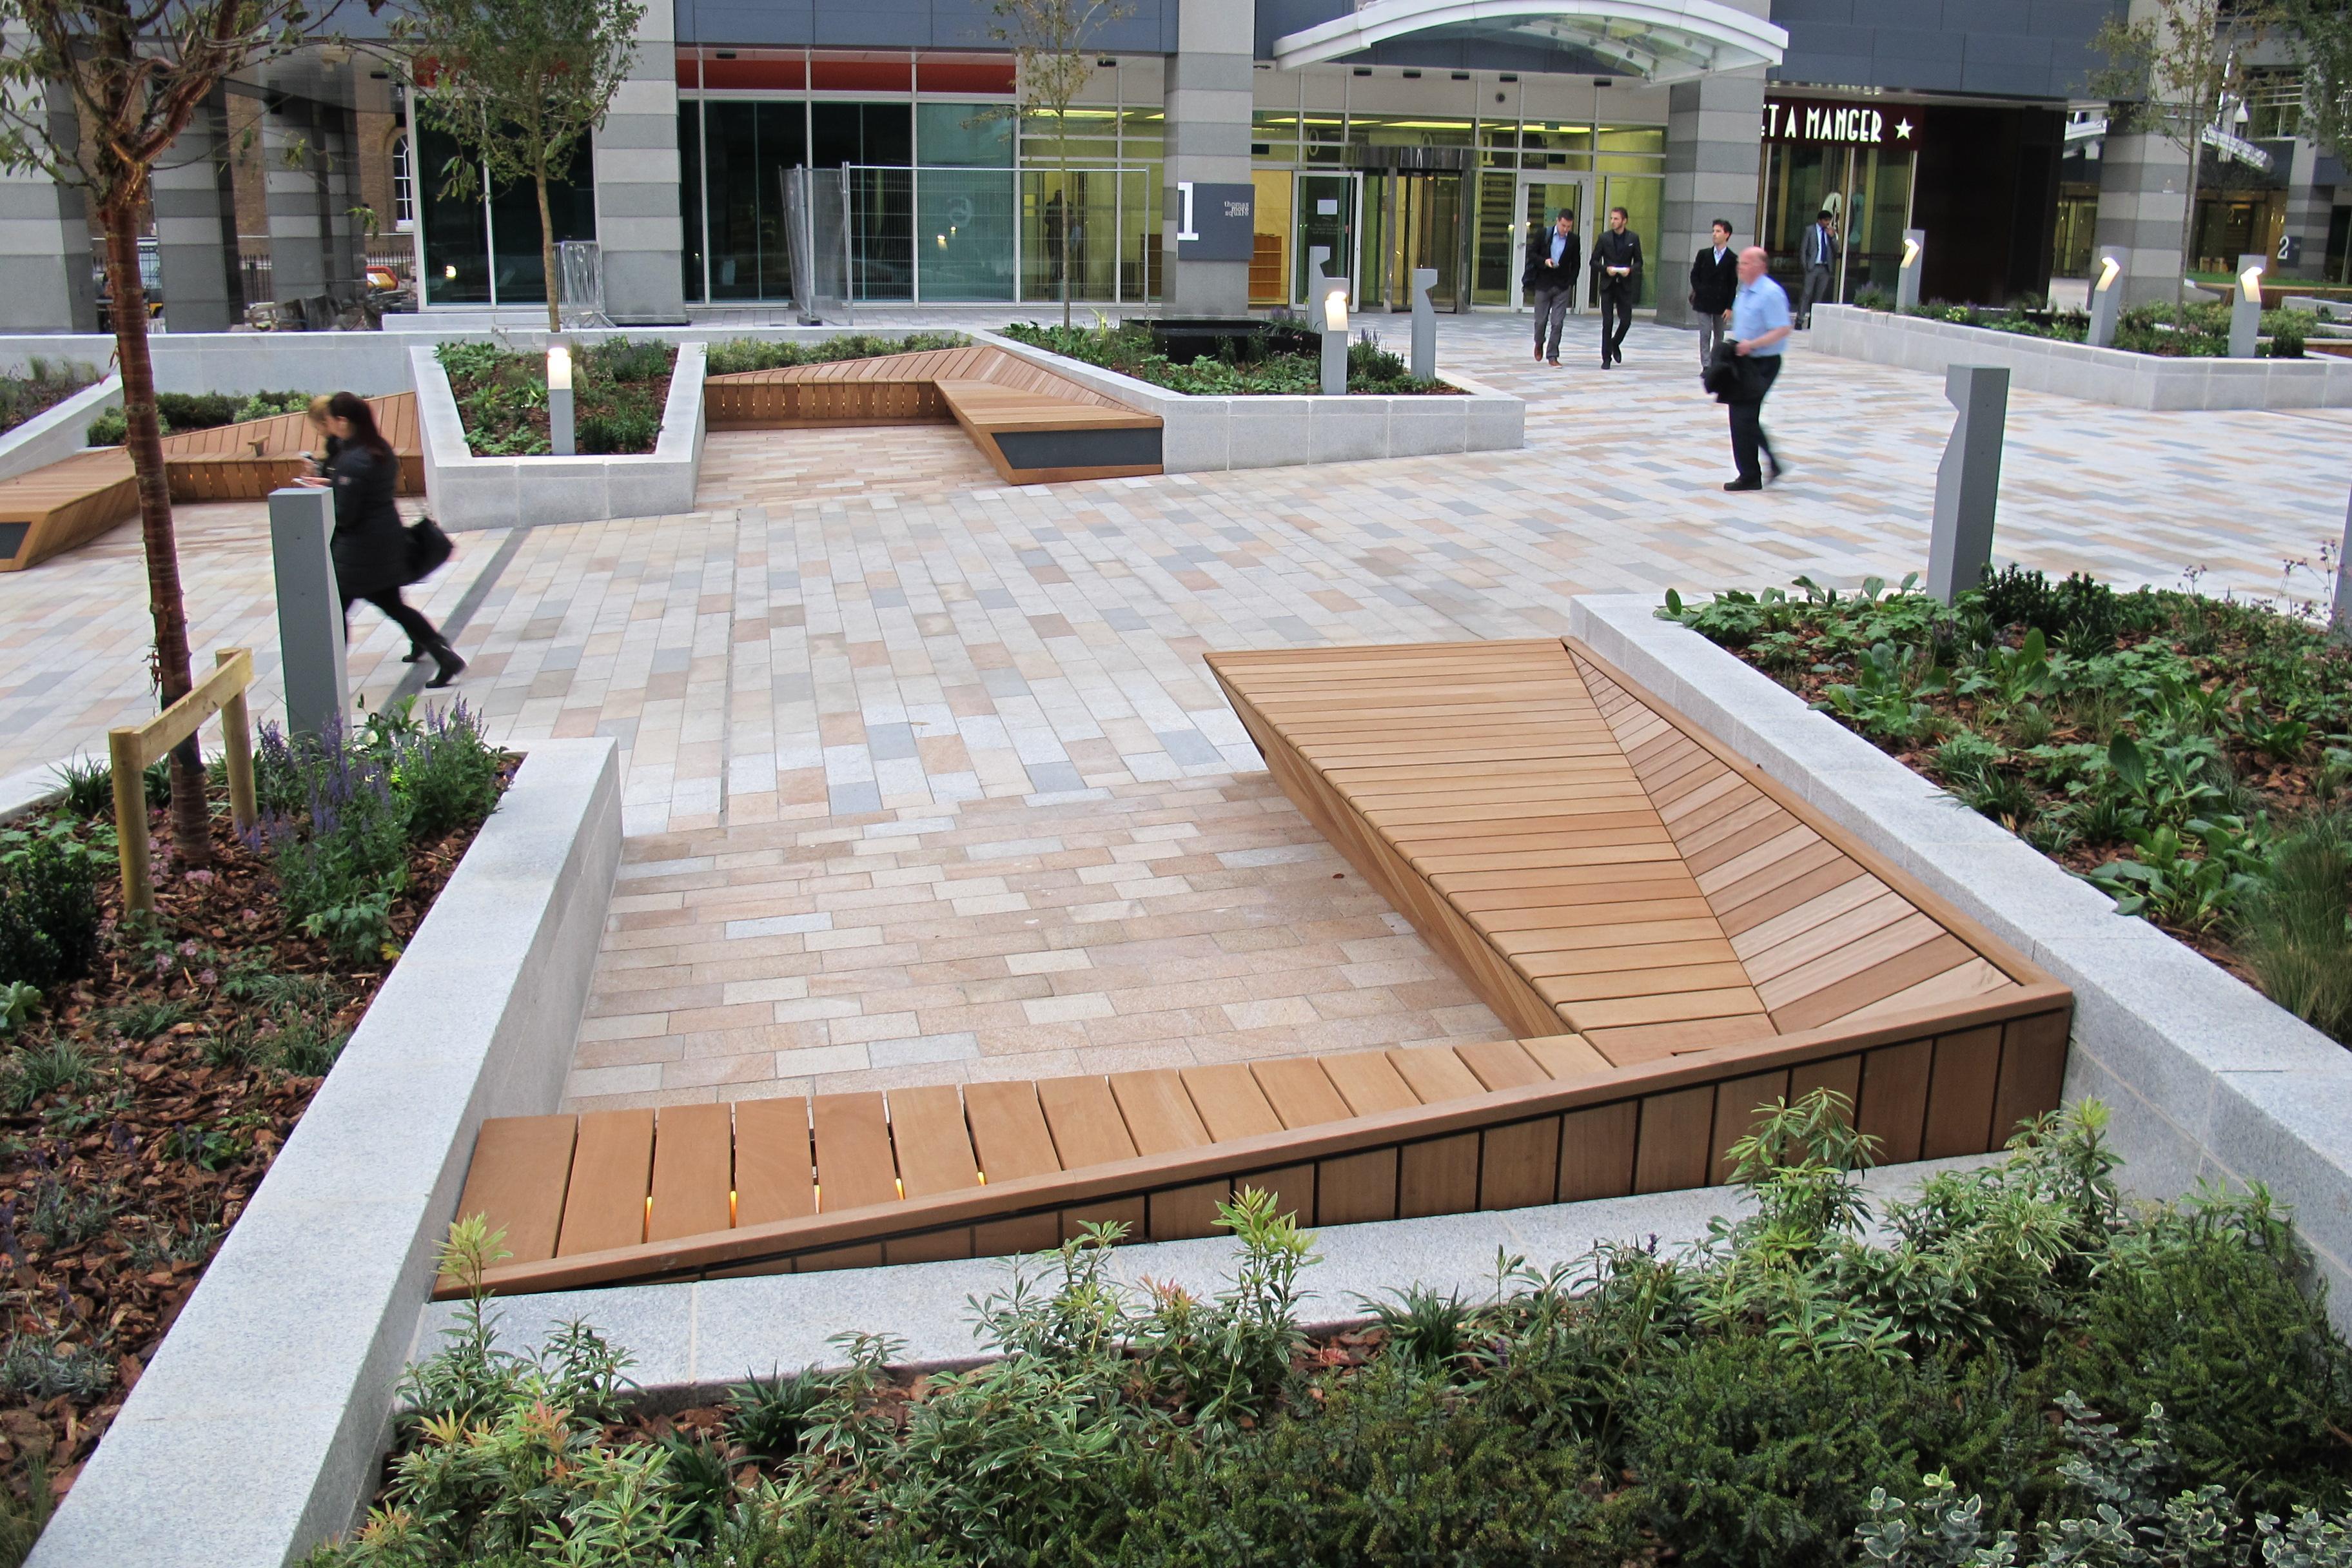 Stunning bespoke seating enhances public realm at Thomas More Square, London